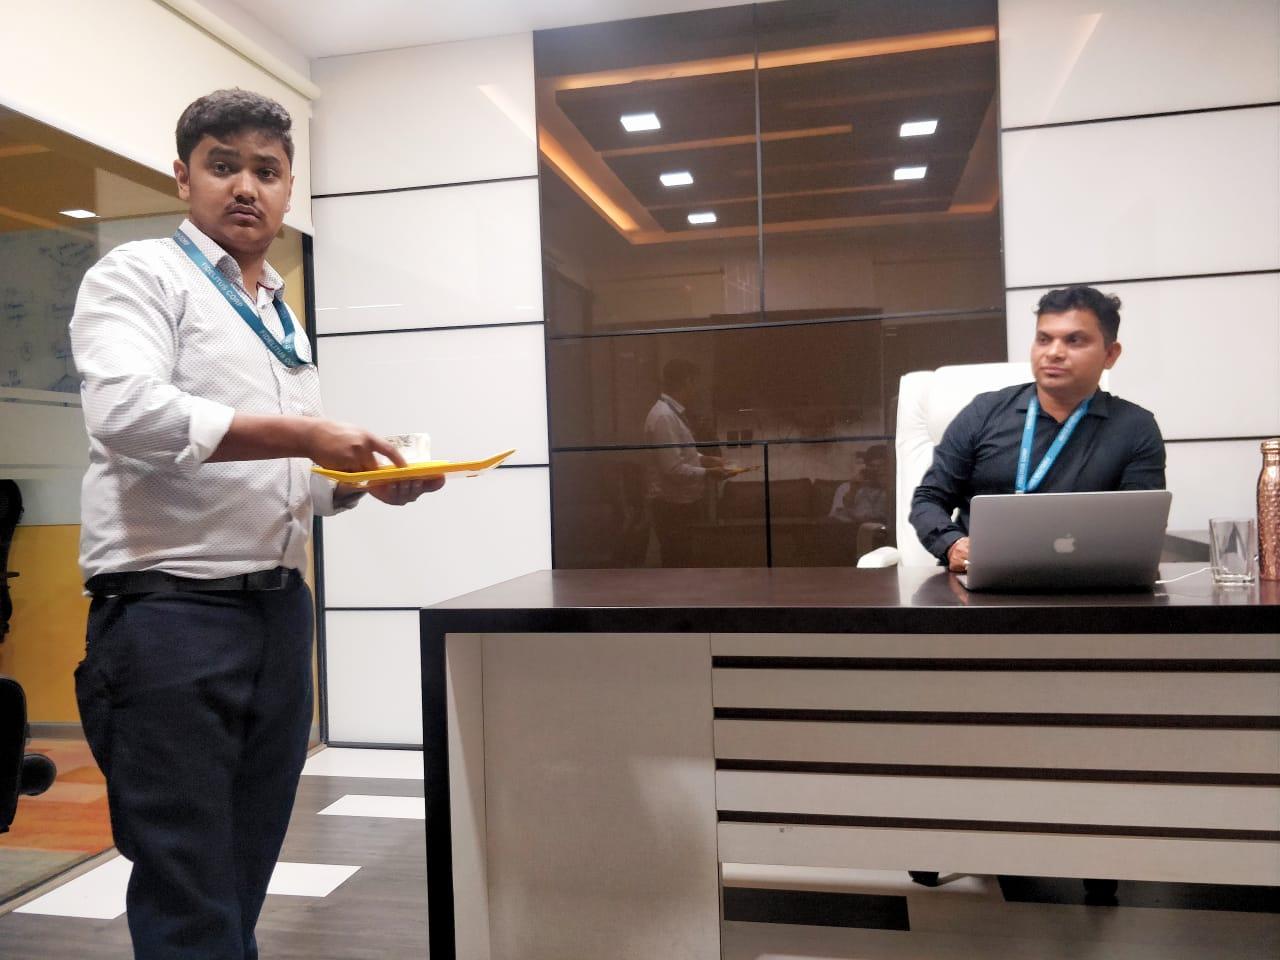 Abolition of COVID-19 is all Our Responsibility: Achuth Gowda,MD Fidelitus Corp (ಕೊರೋನಾ ನಿರ್ಮೂಲನೆ ನಮ್ಮೆಲ್ಲರ ಹೊಣೆ: ಅಚ್ಚುತ್ ಗೌಡ, ಎಂಡಿ-ಫಿಡಿಲಿಟಸ್ ಕಾರ್ಪ್)